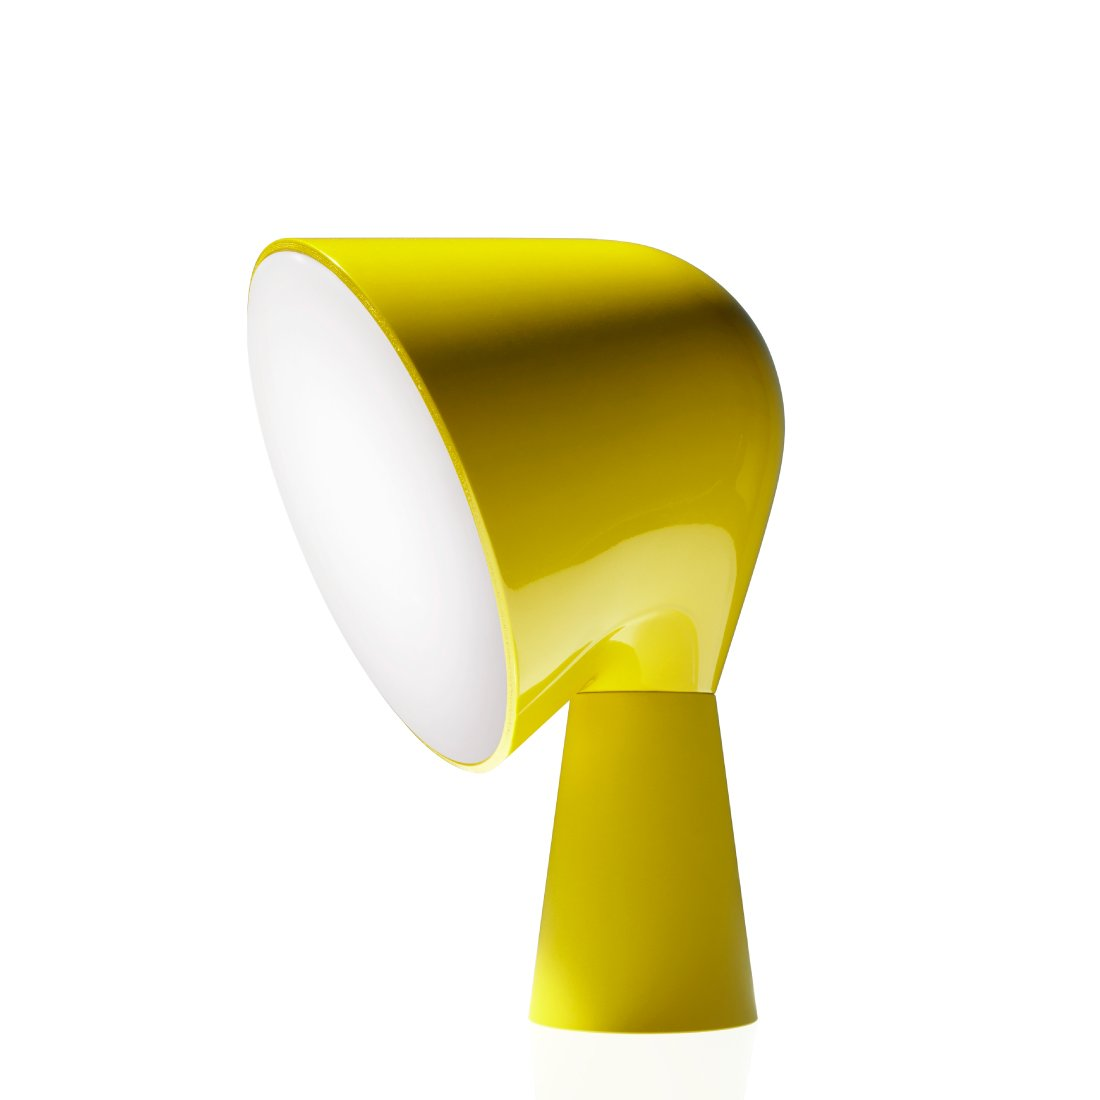 Foscarini Binic Tafellamp Geel